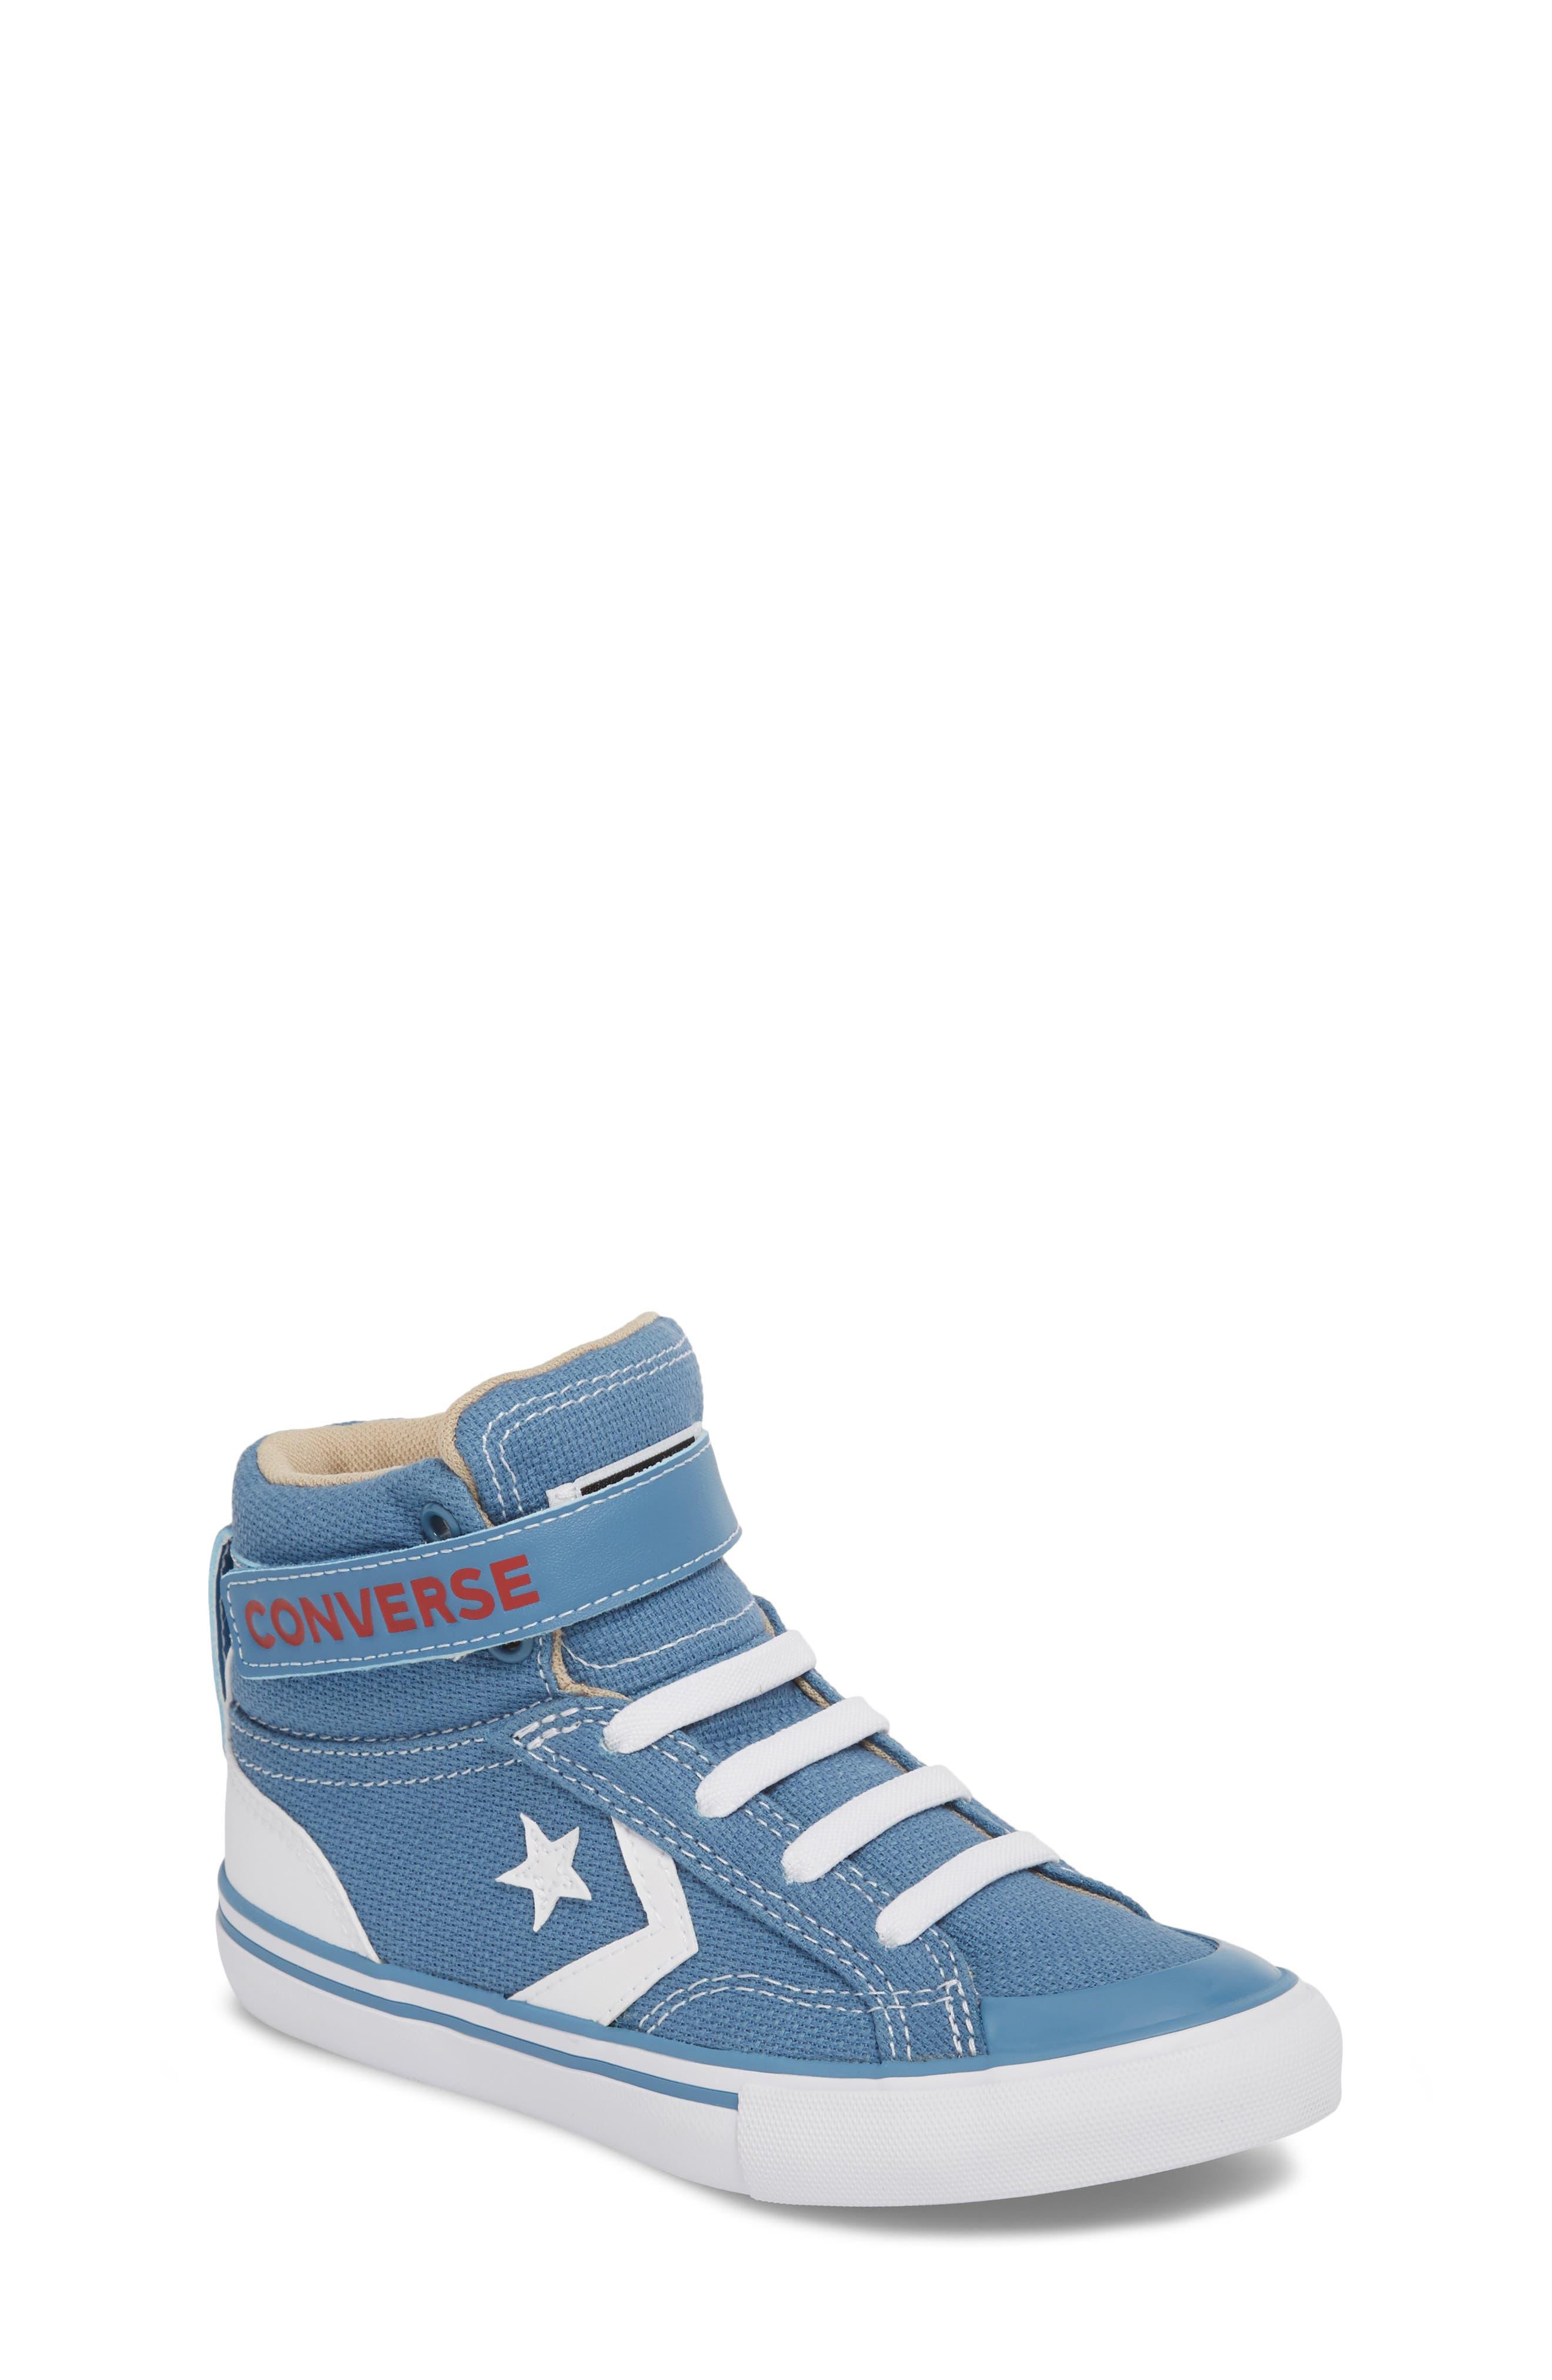 Pro Blaze High Top Sneaker,                         Main,                         color,